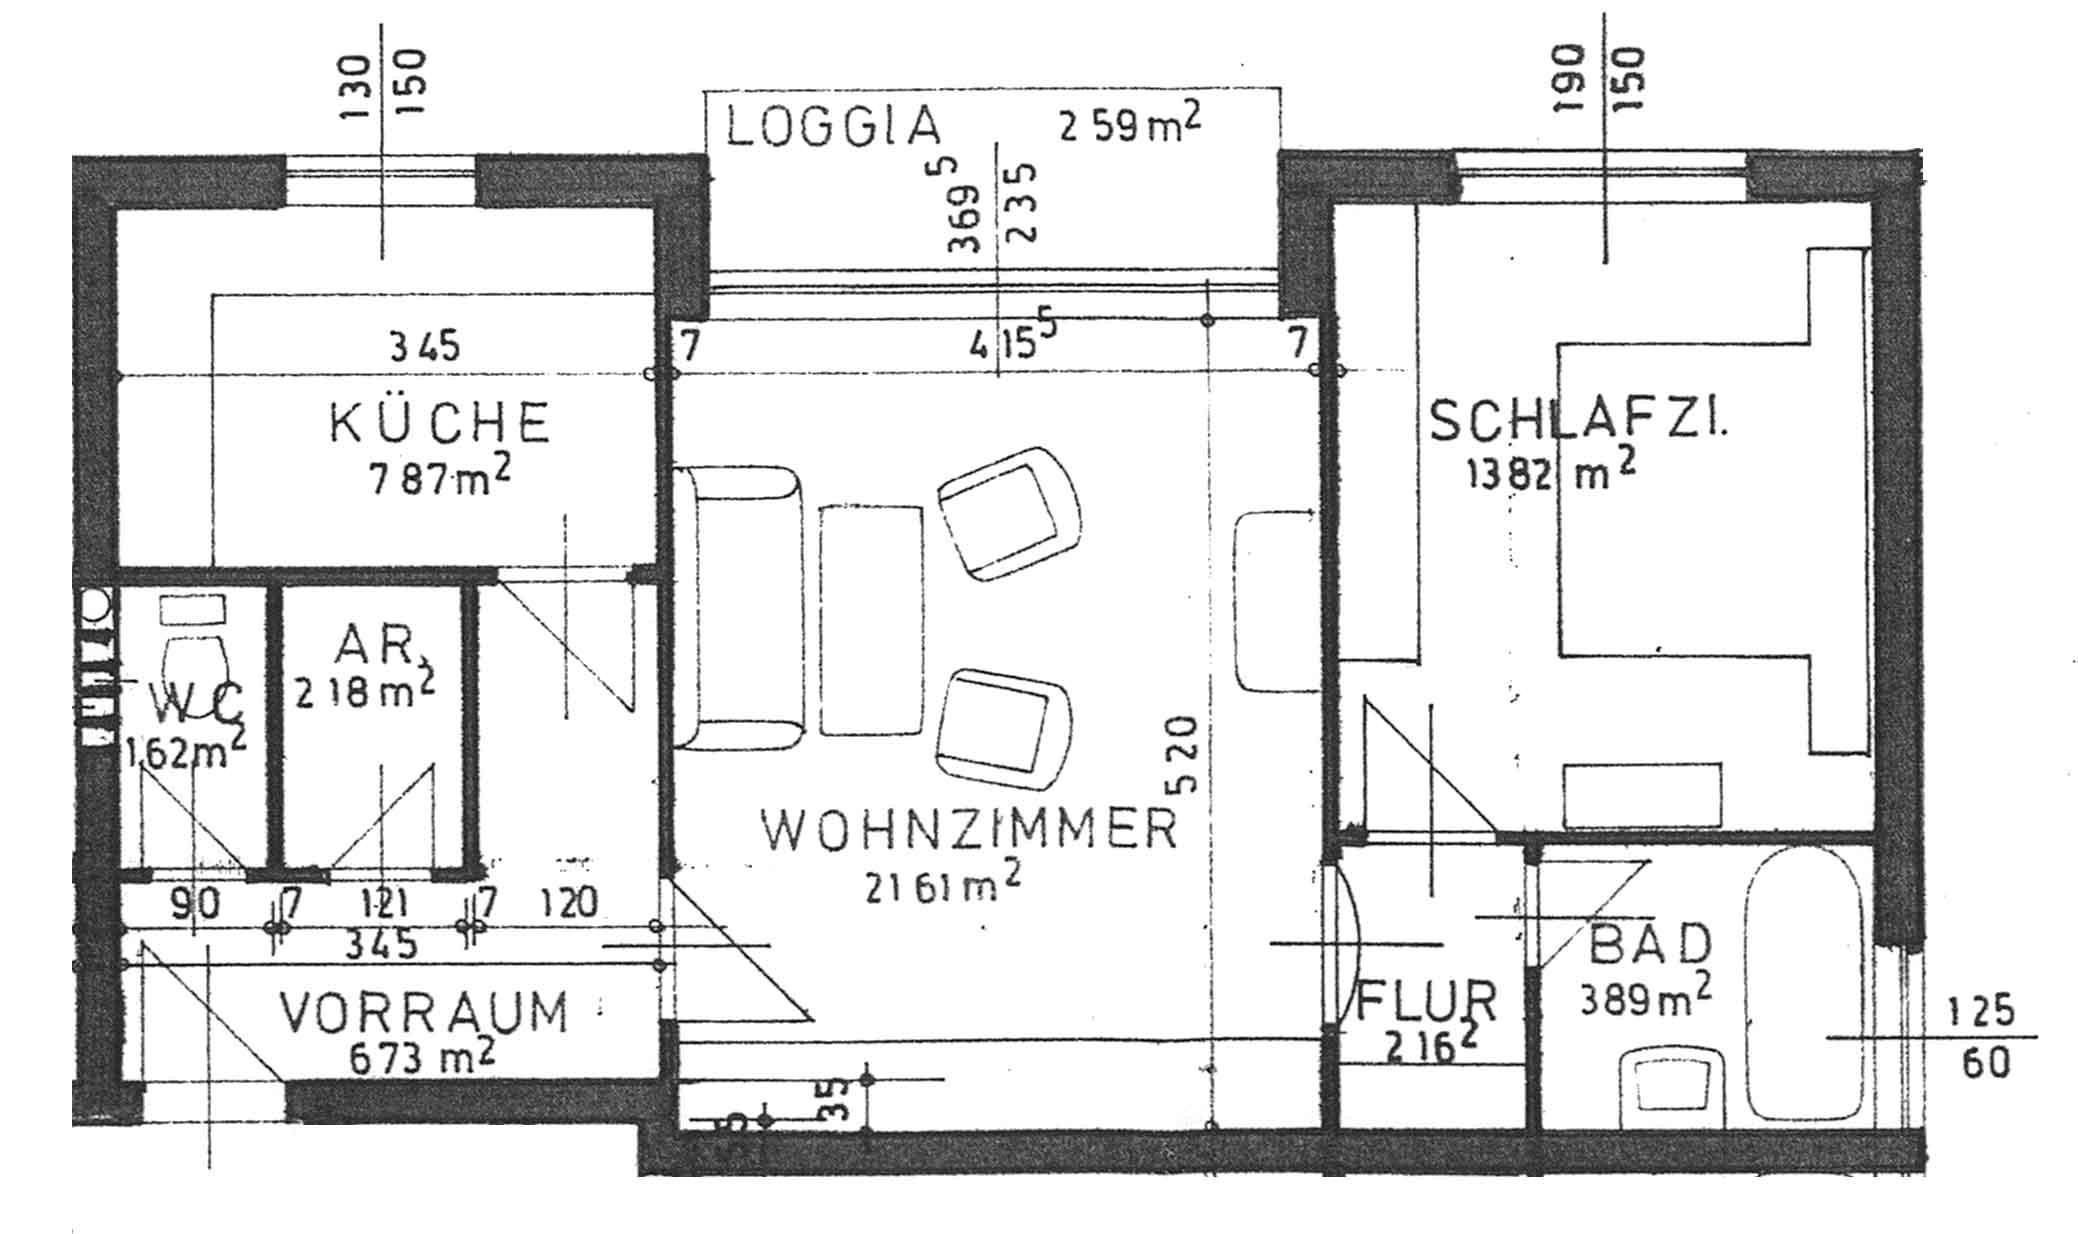 Immobilie von LAWOG in Hansbergstr.3/3, 4171 St. Peter am Wimberg #1